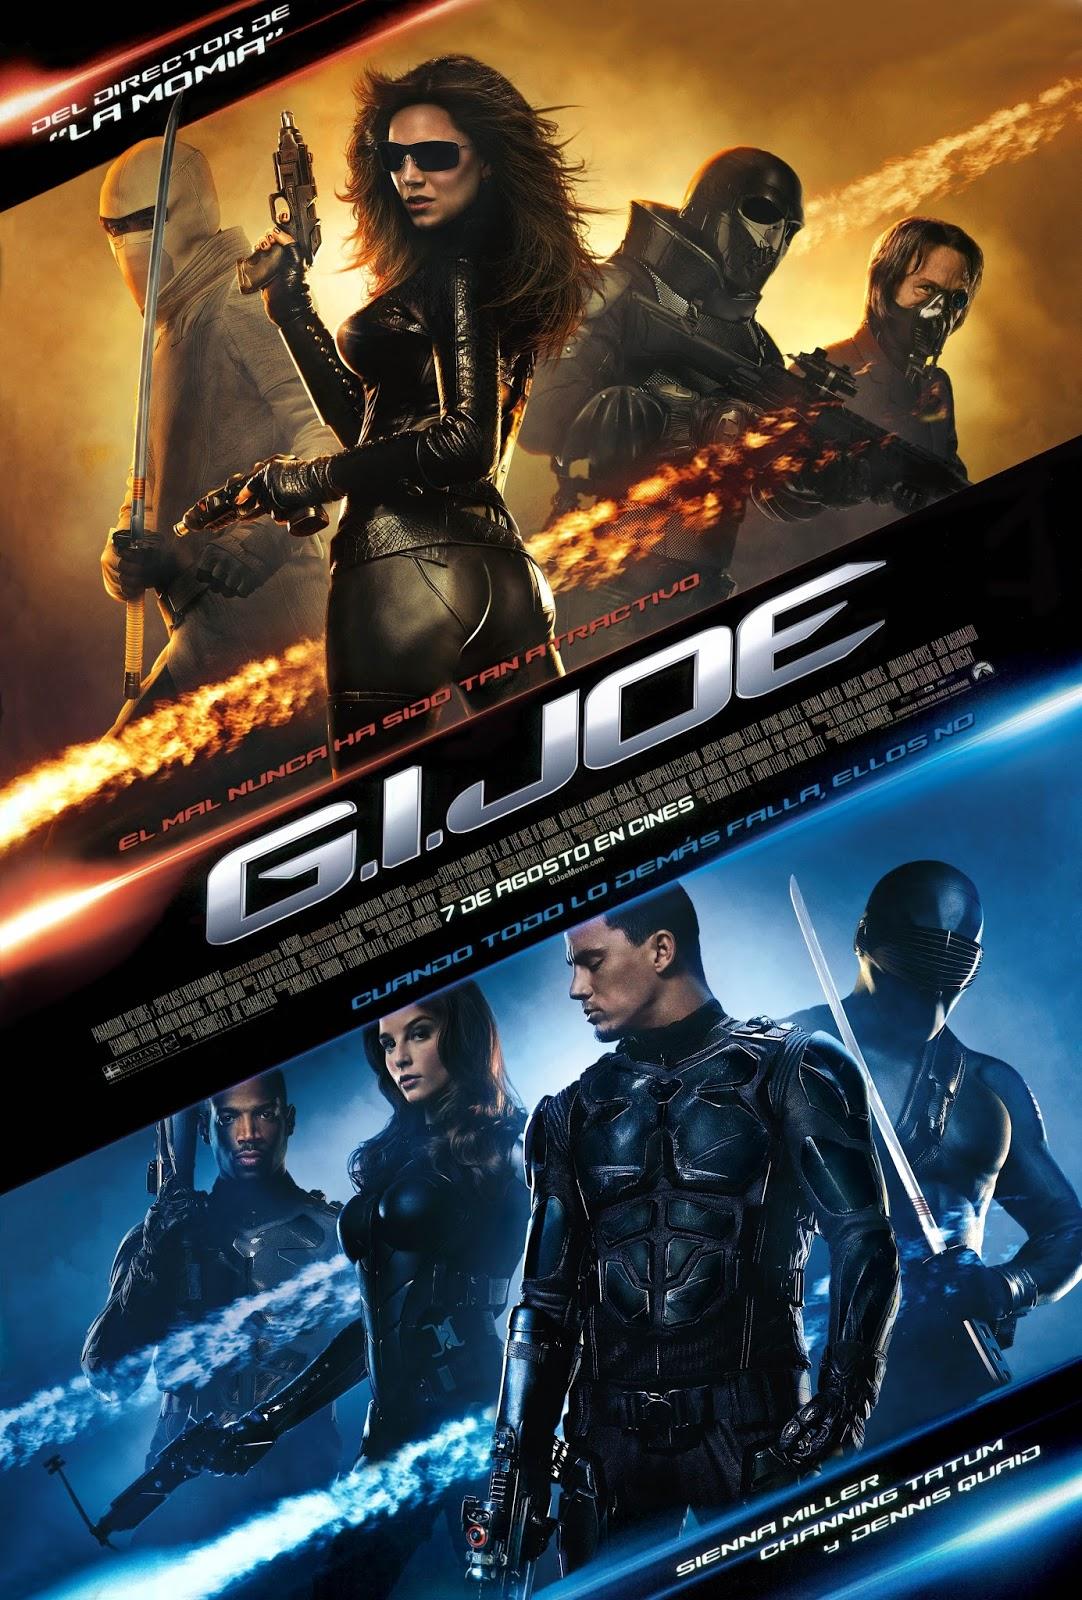 G. I. Joe: retaliation & the rise of cobra on 4k blu-ray this.